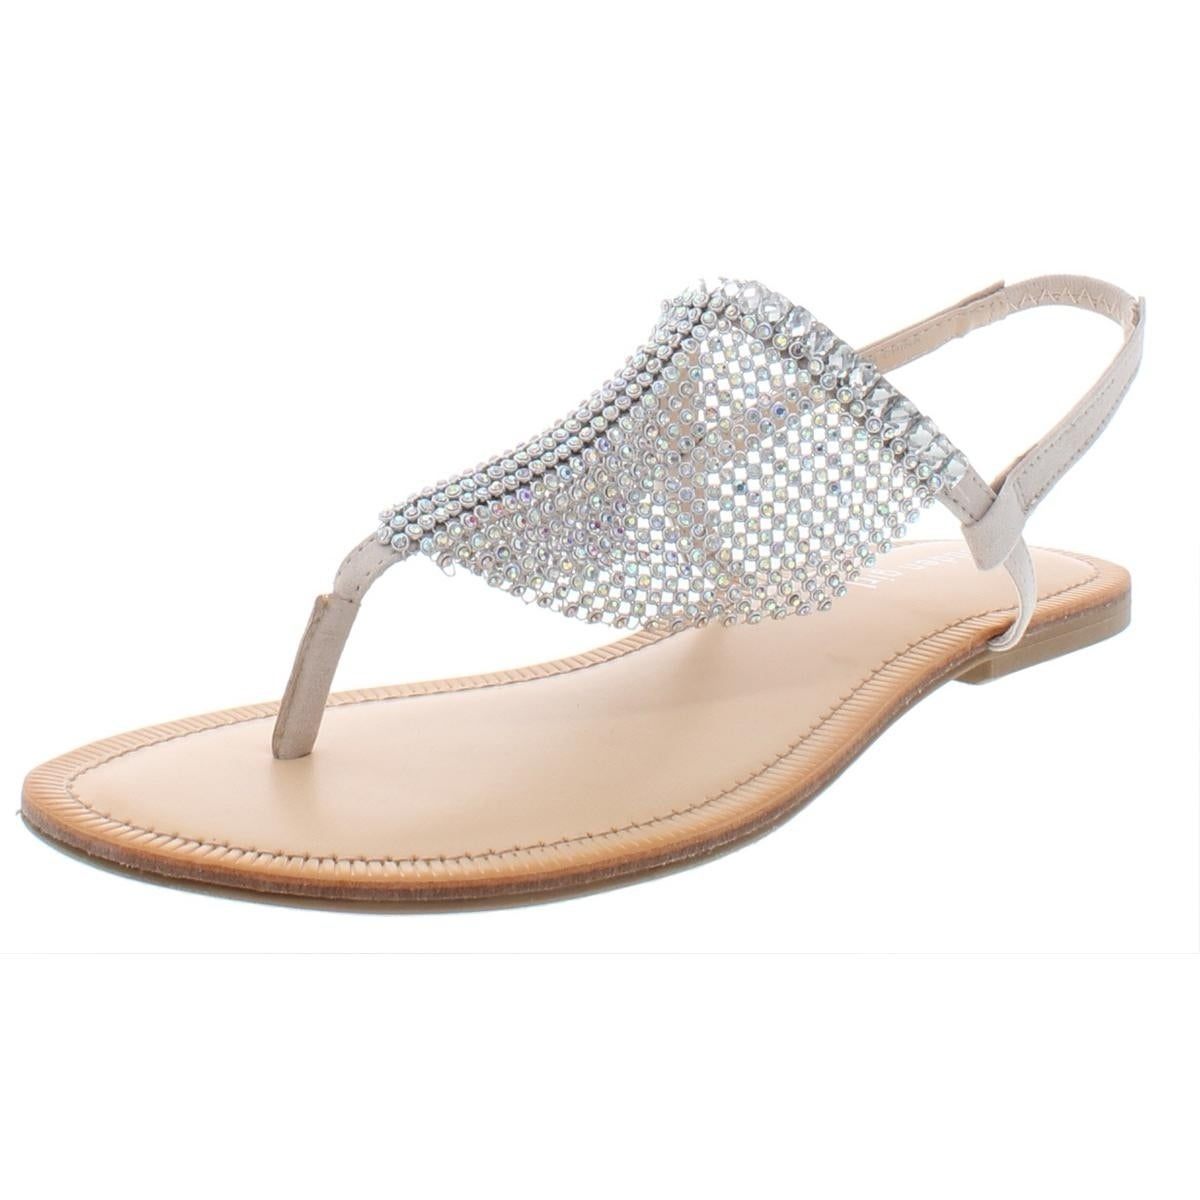 Shop Madden Girl Womens Sabell Thong